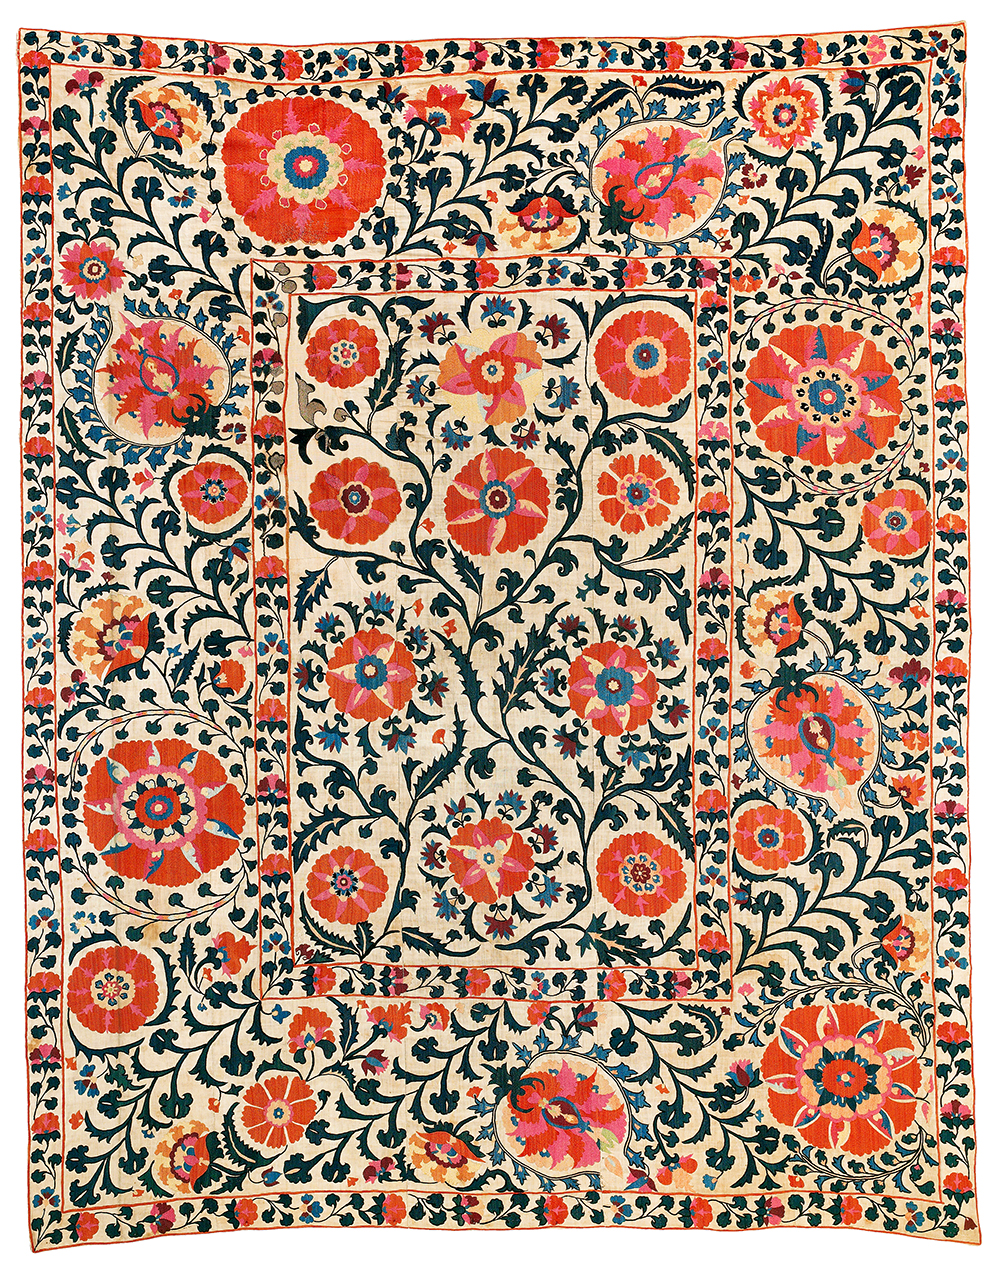 Lot 132, Suzani, Uzbekistan, 18th century, 186 x 232 cm, estimate €24,000